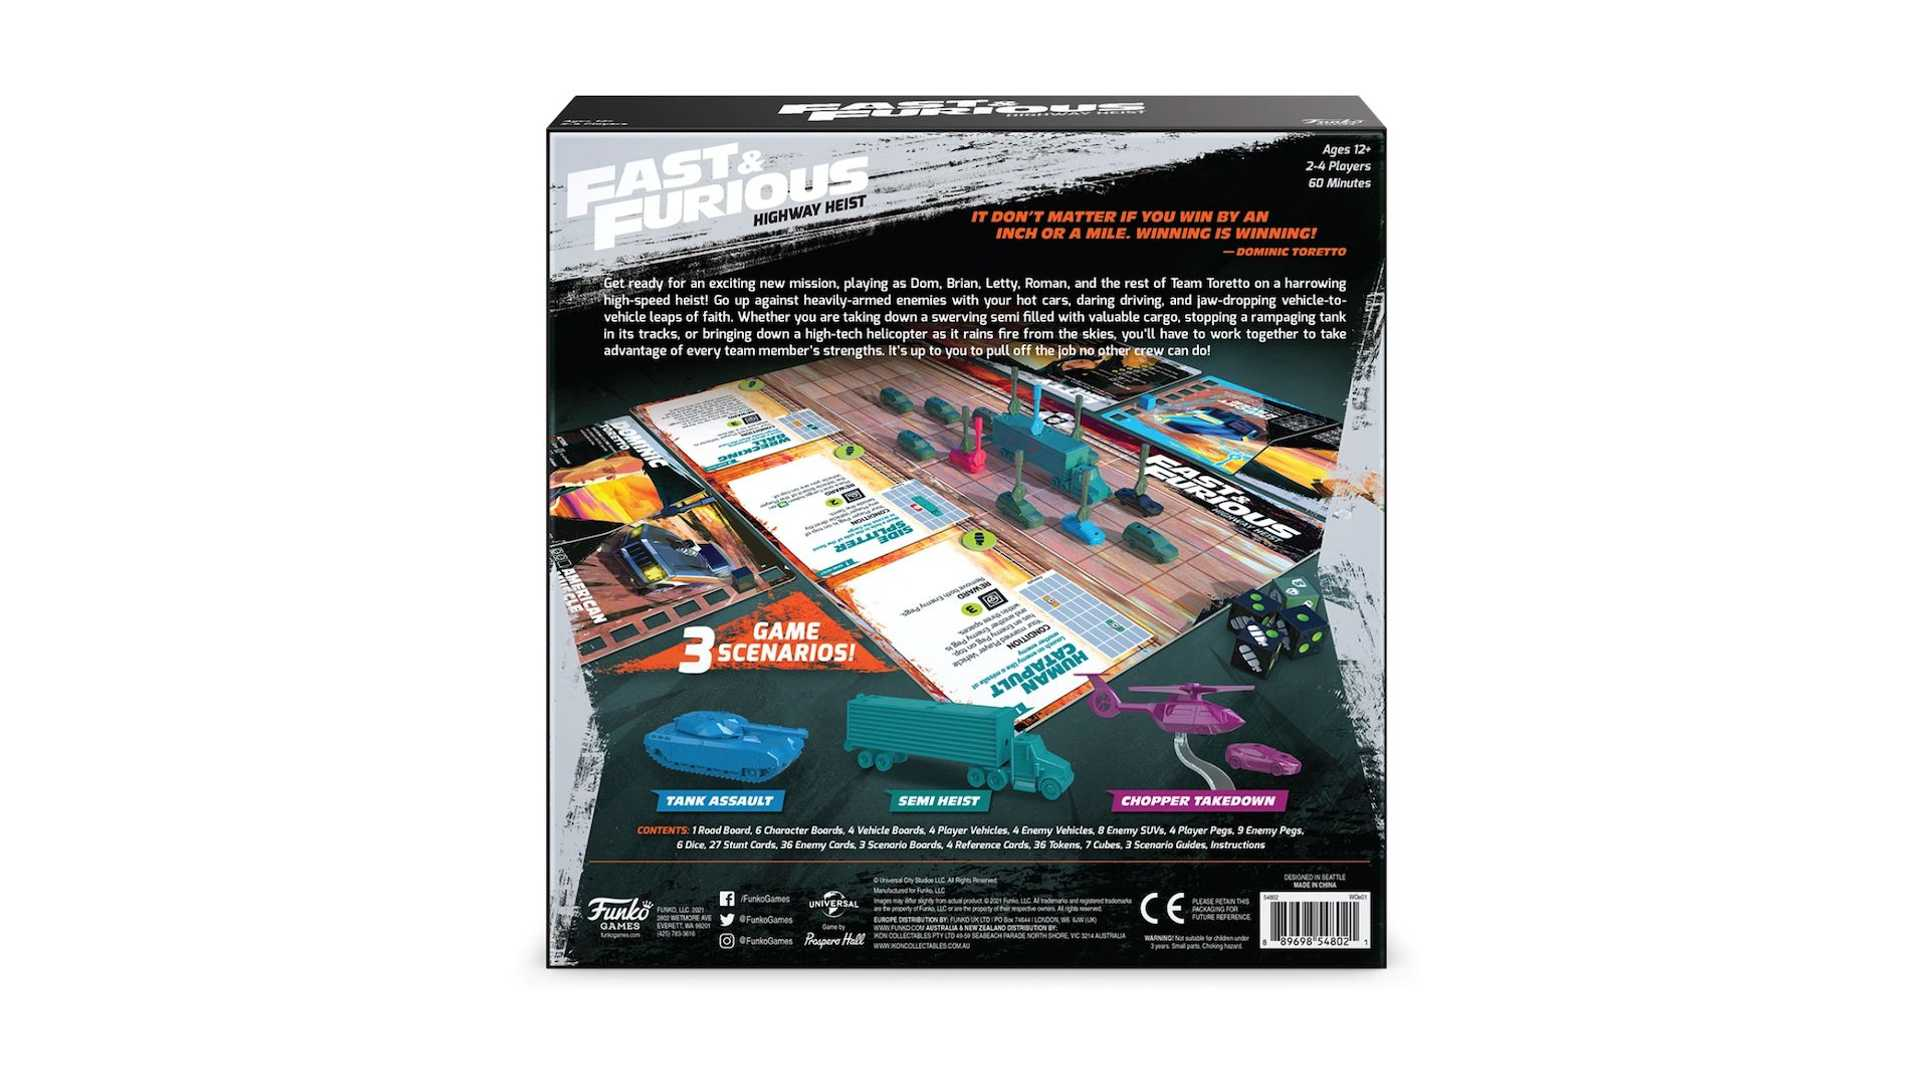 https://cdn.motor1.com/images/mgl/WBWB1/s6/fast-furious-highway-heist-board-game.jpg